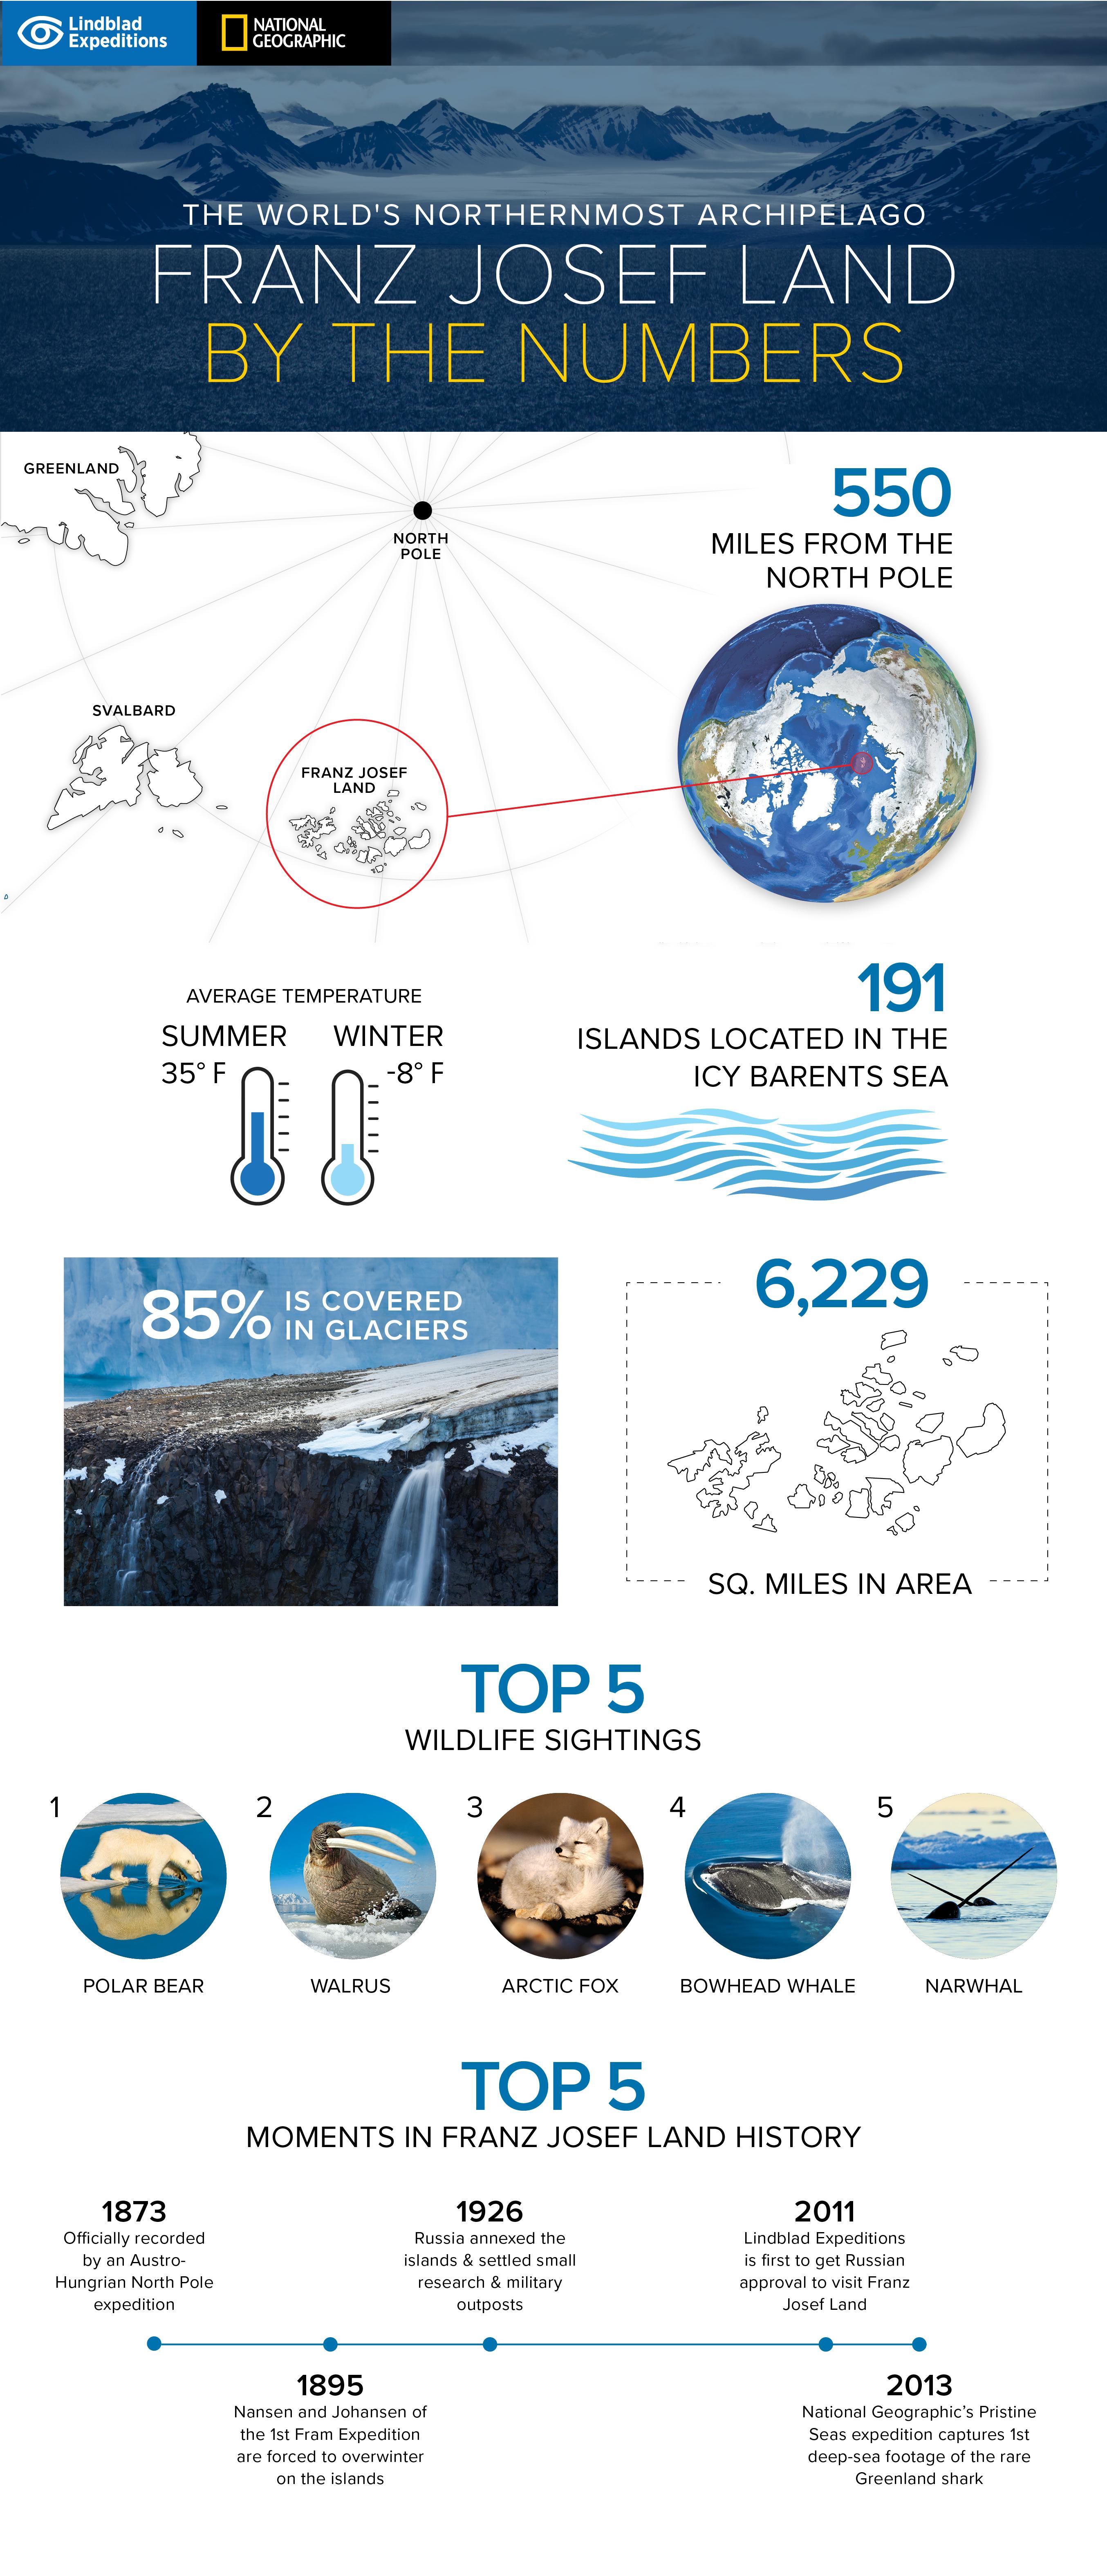 FranzJosefLand_Infographic (1).jpg